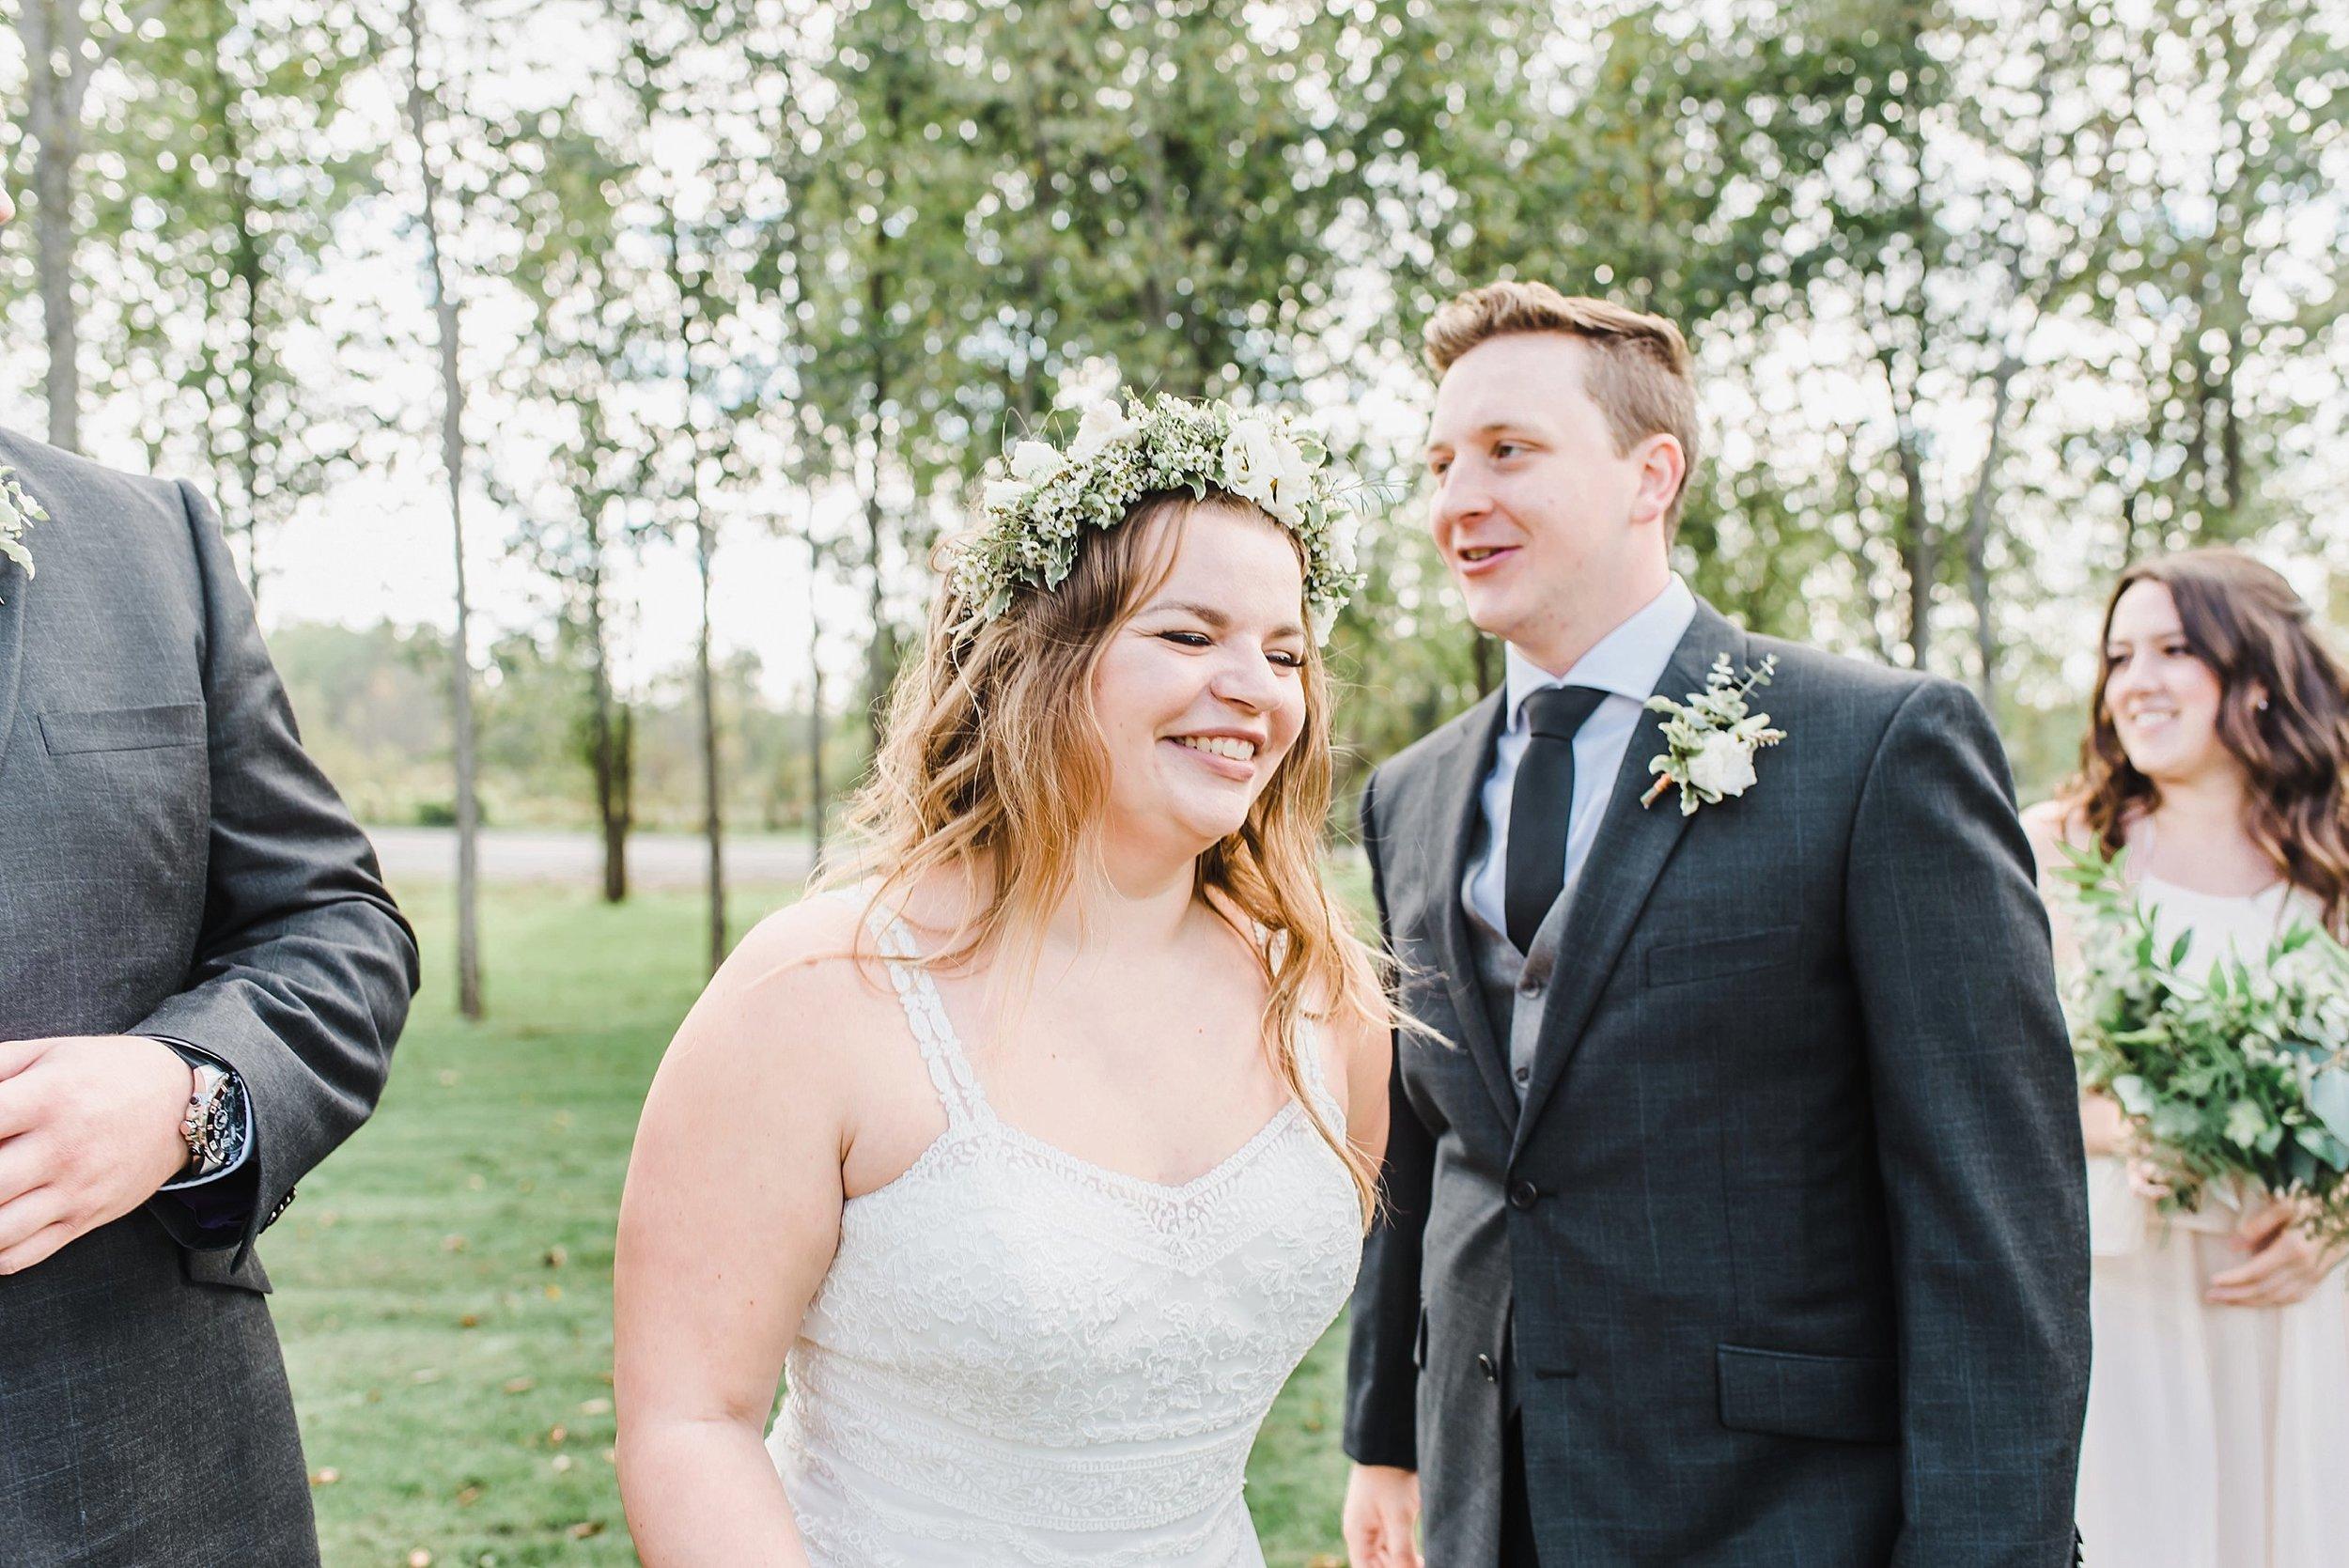 light airy indie fine art ottawa wedding photographer | Ali and Batoul Photography_1132.jpg